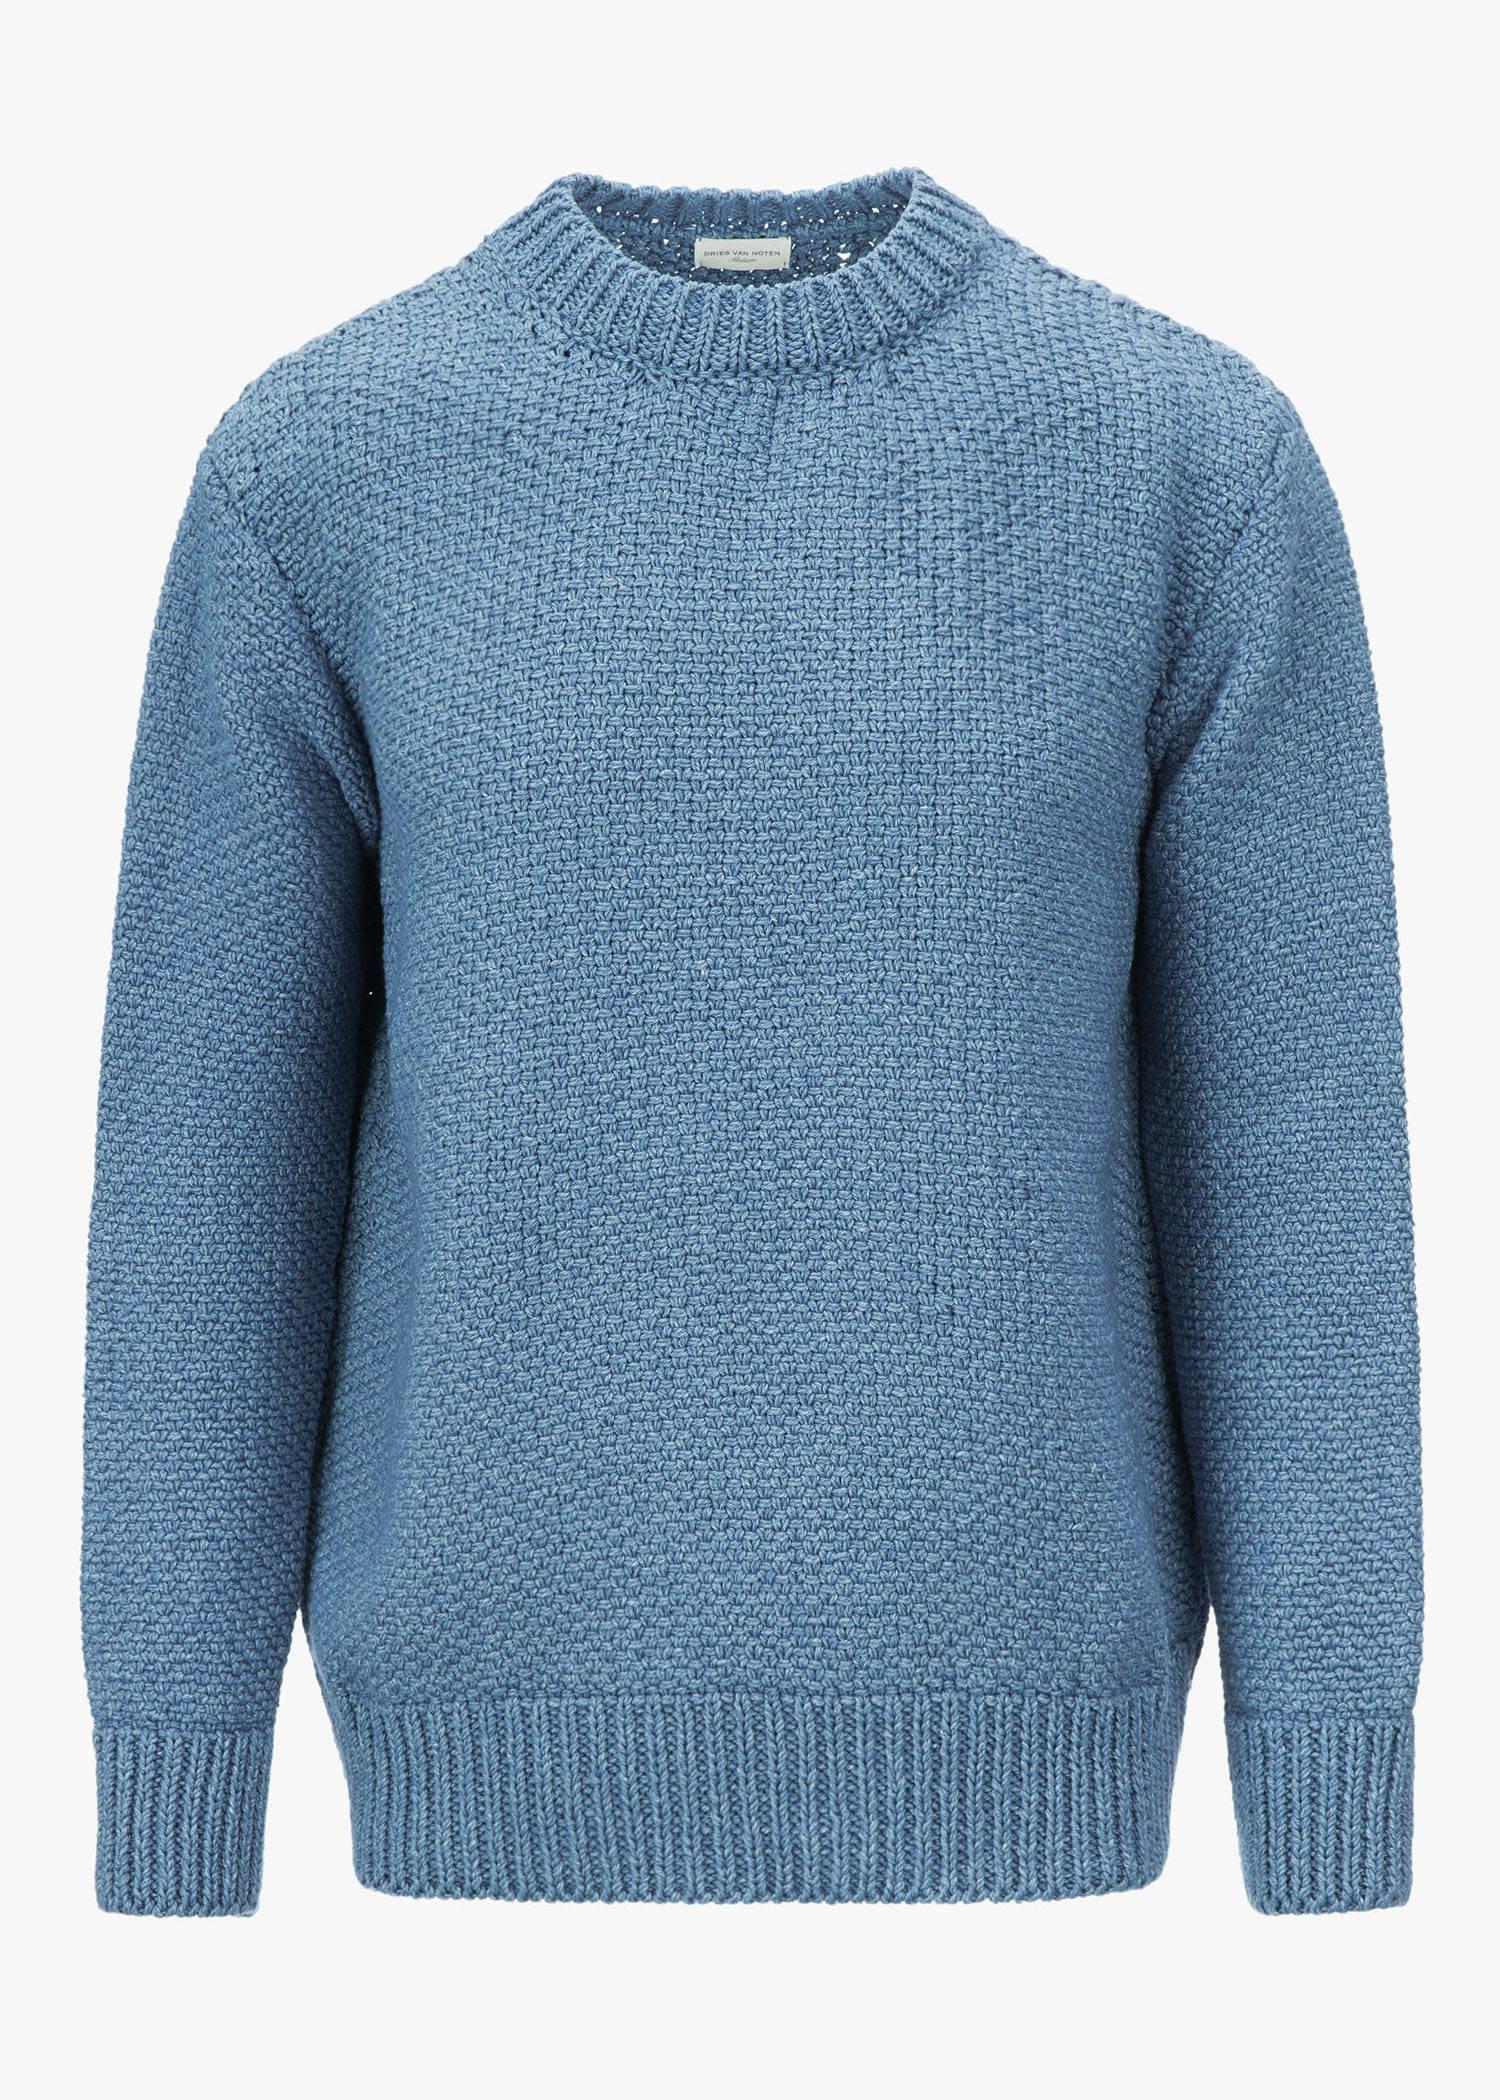 Dries Van Noten Neighbour Sweater In Light Blue